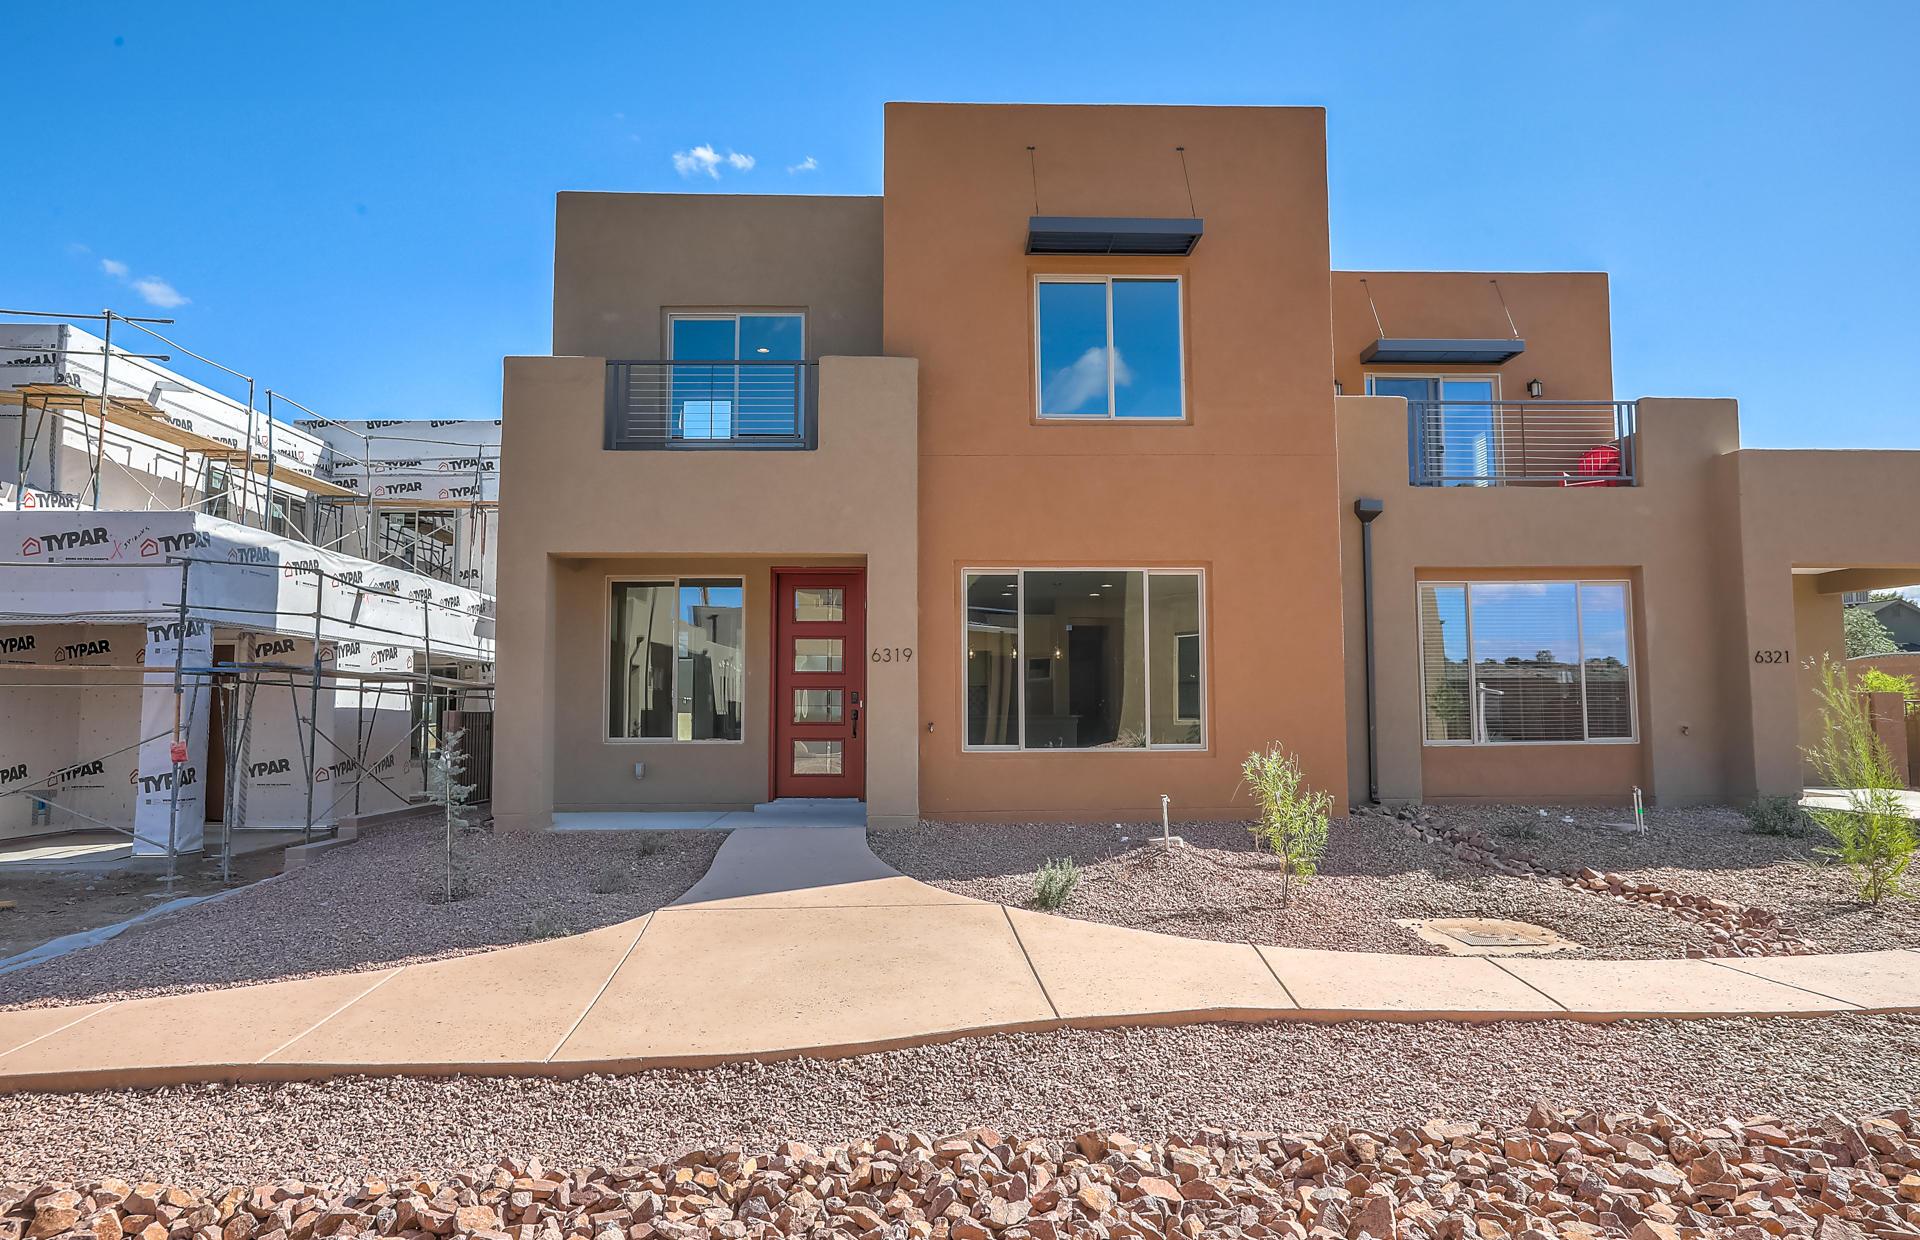 6319 NW Vista del Bosque Drive, Northwest Albuquerque and Northwest Heights, New Mexico